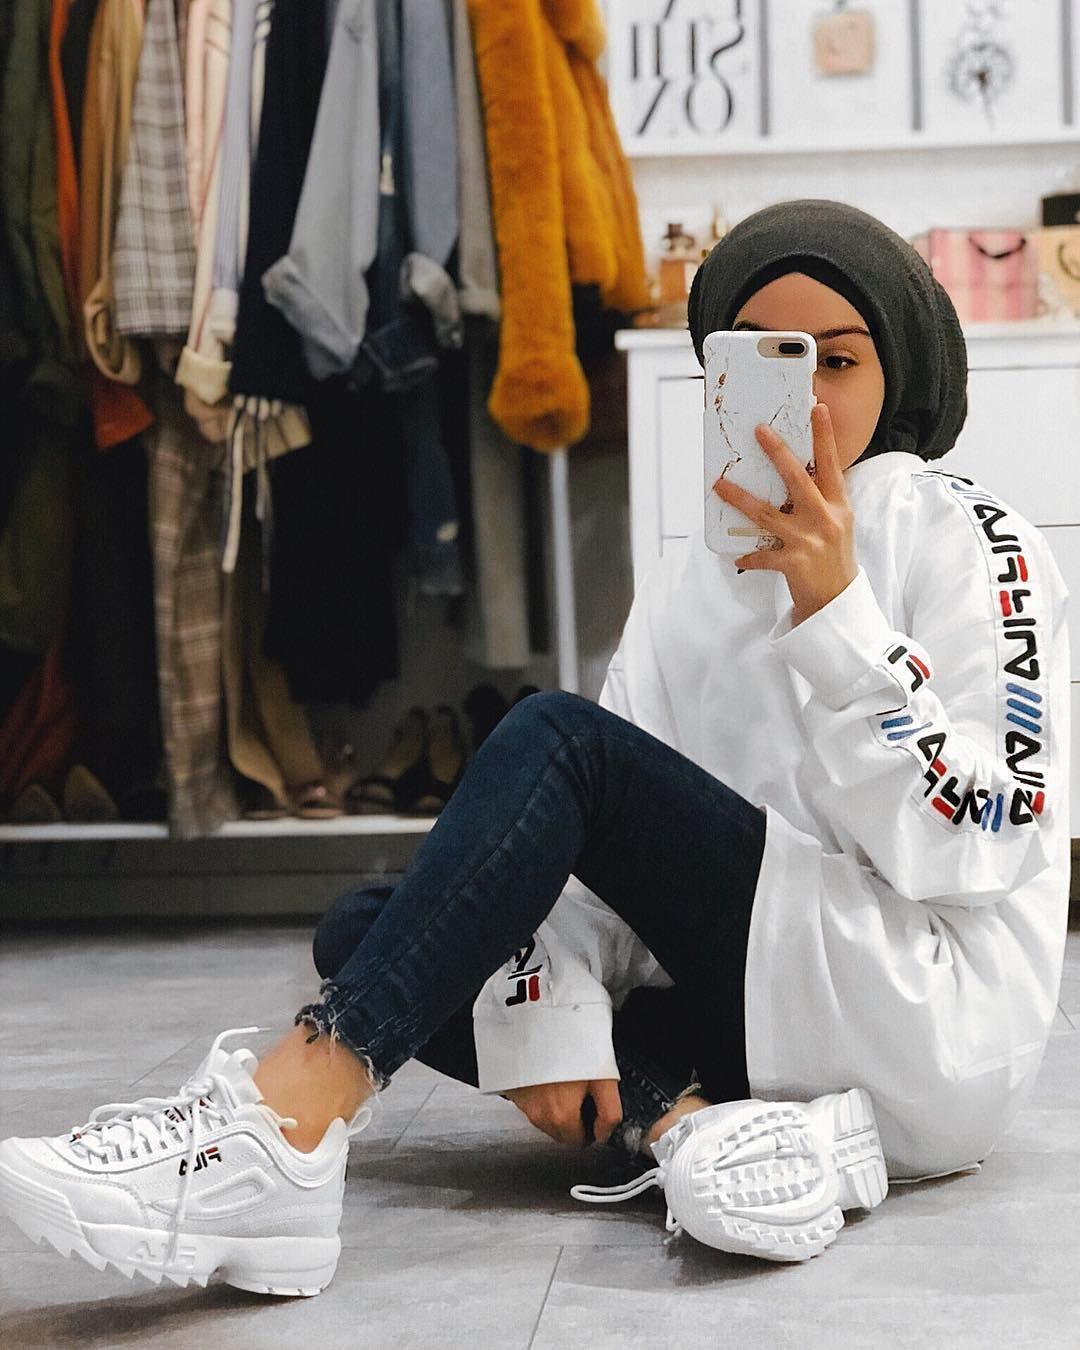 𝐒 𝐄 𝐍 𝐀 On Instagram 𝐀𝐍𝐙𝐄𝐈𝐆𝐄 In 2020 Muslimische